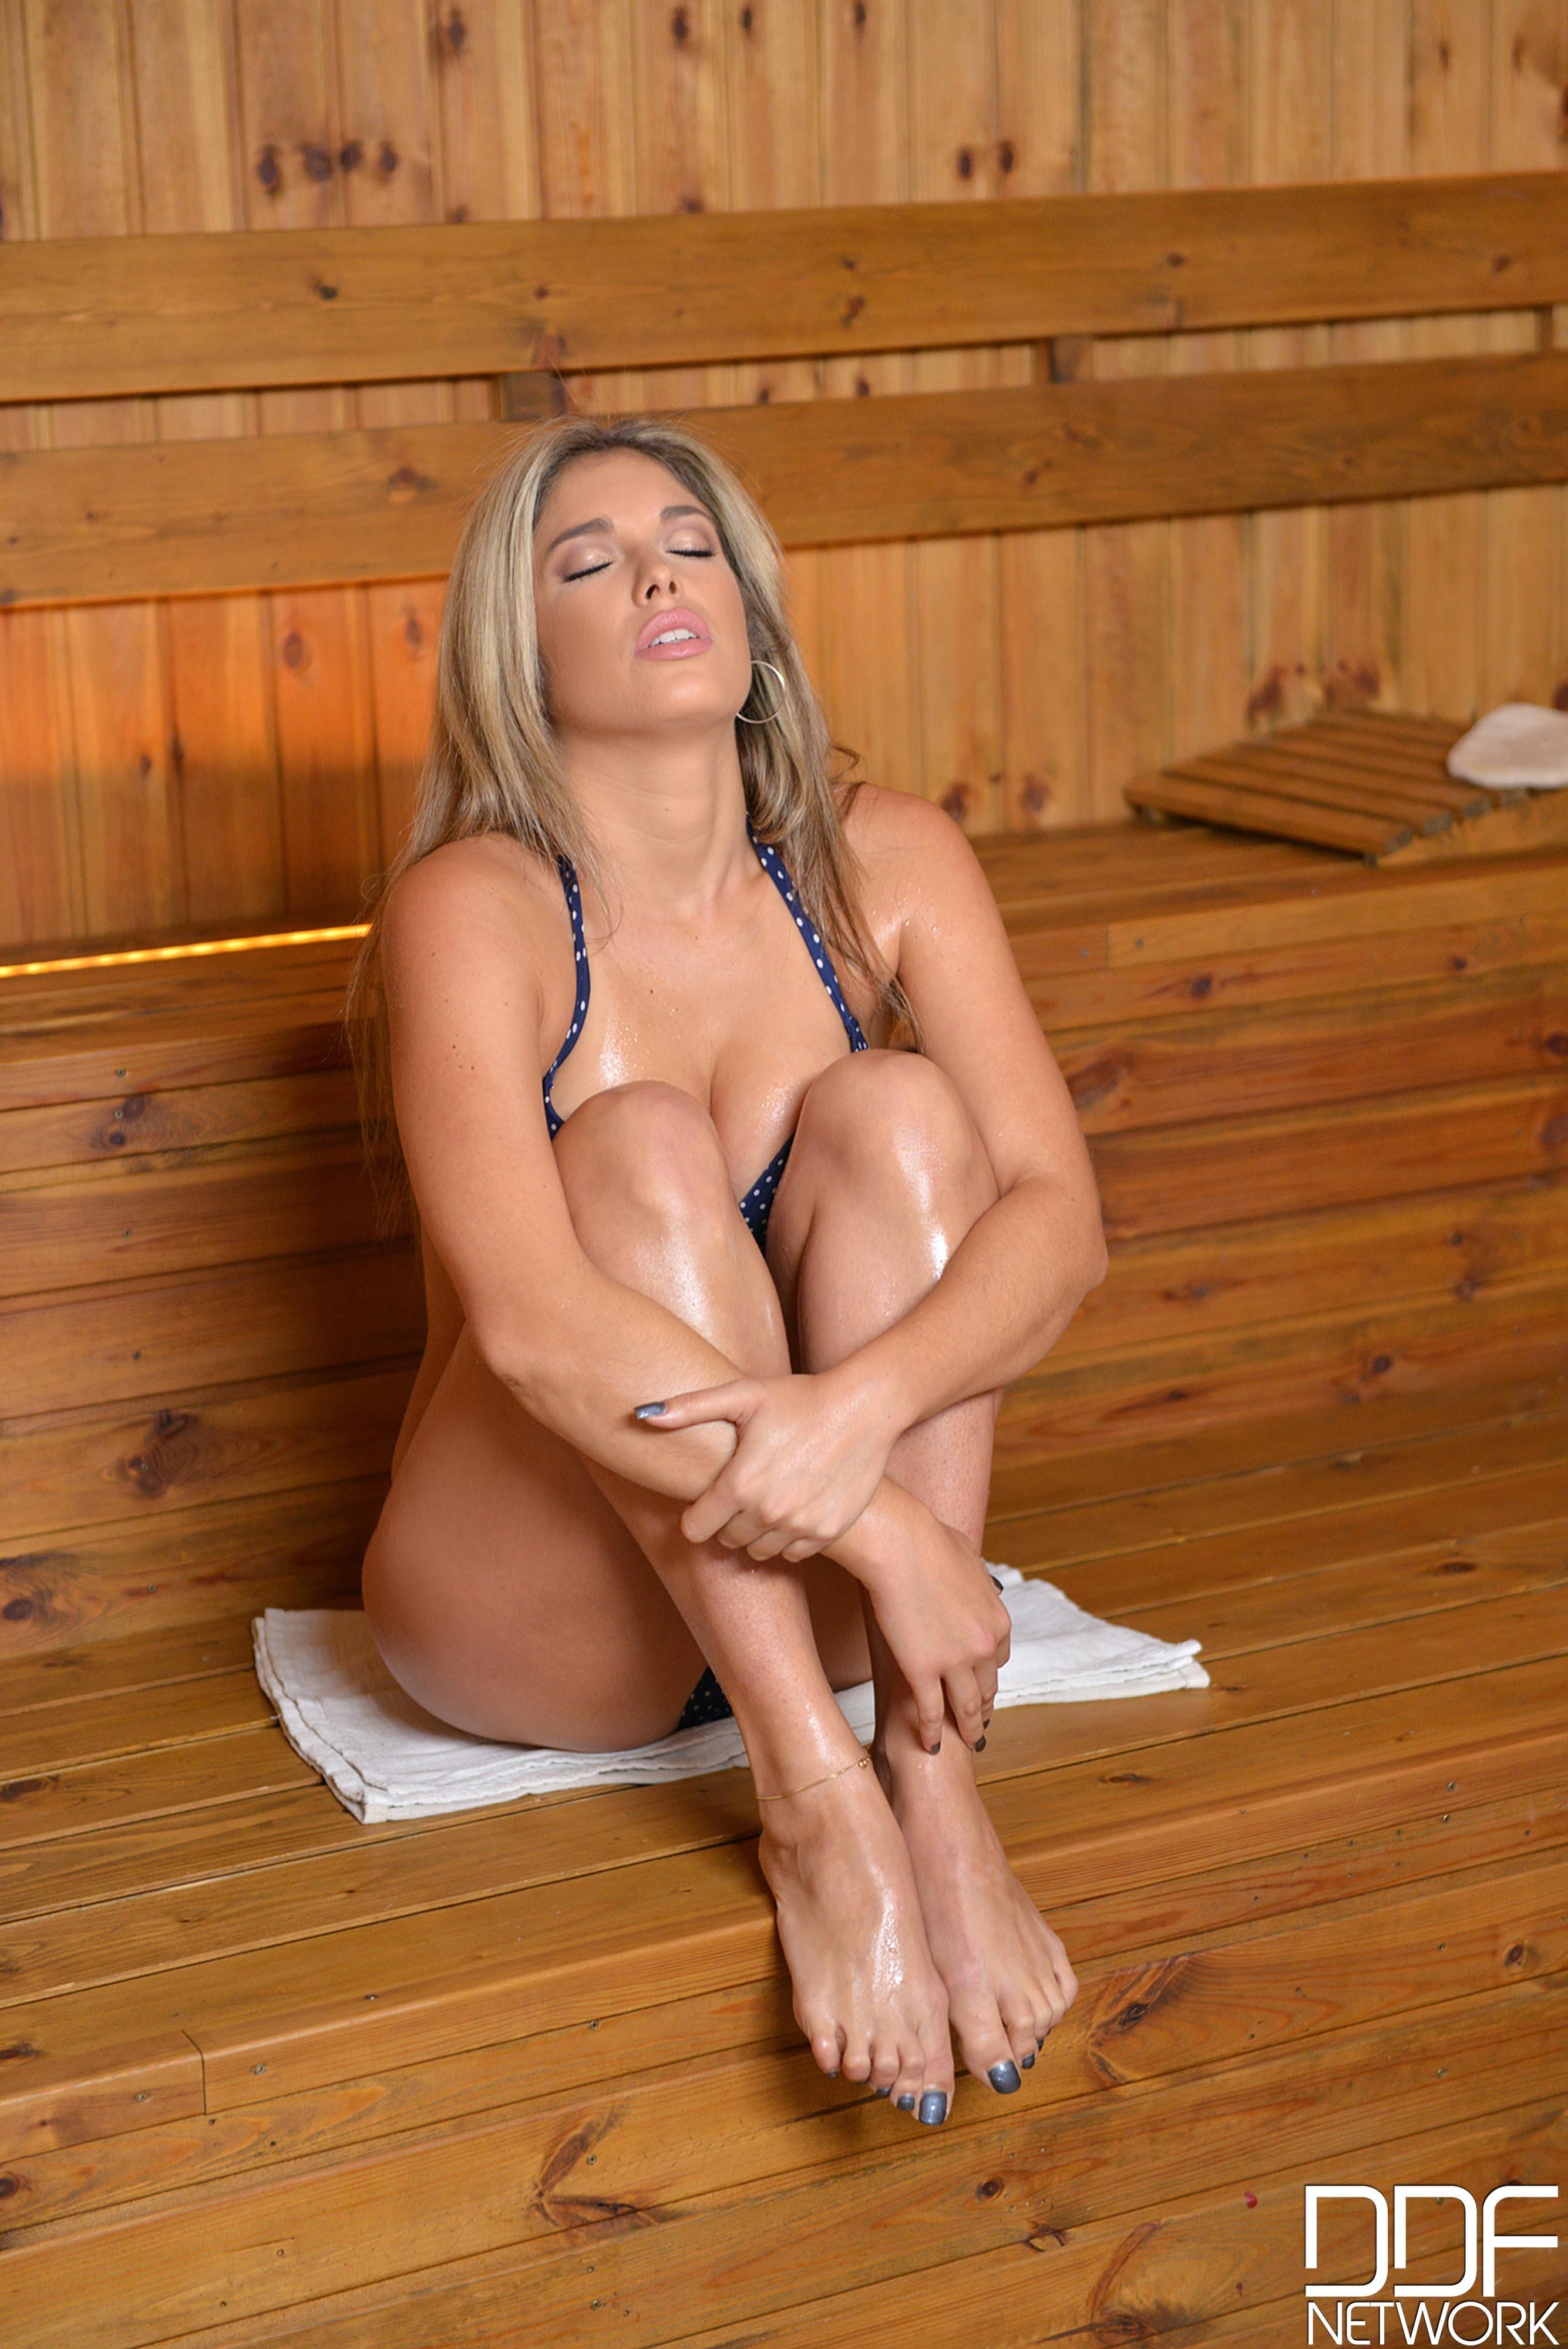 Eva Parcker фото эротика и порно